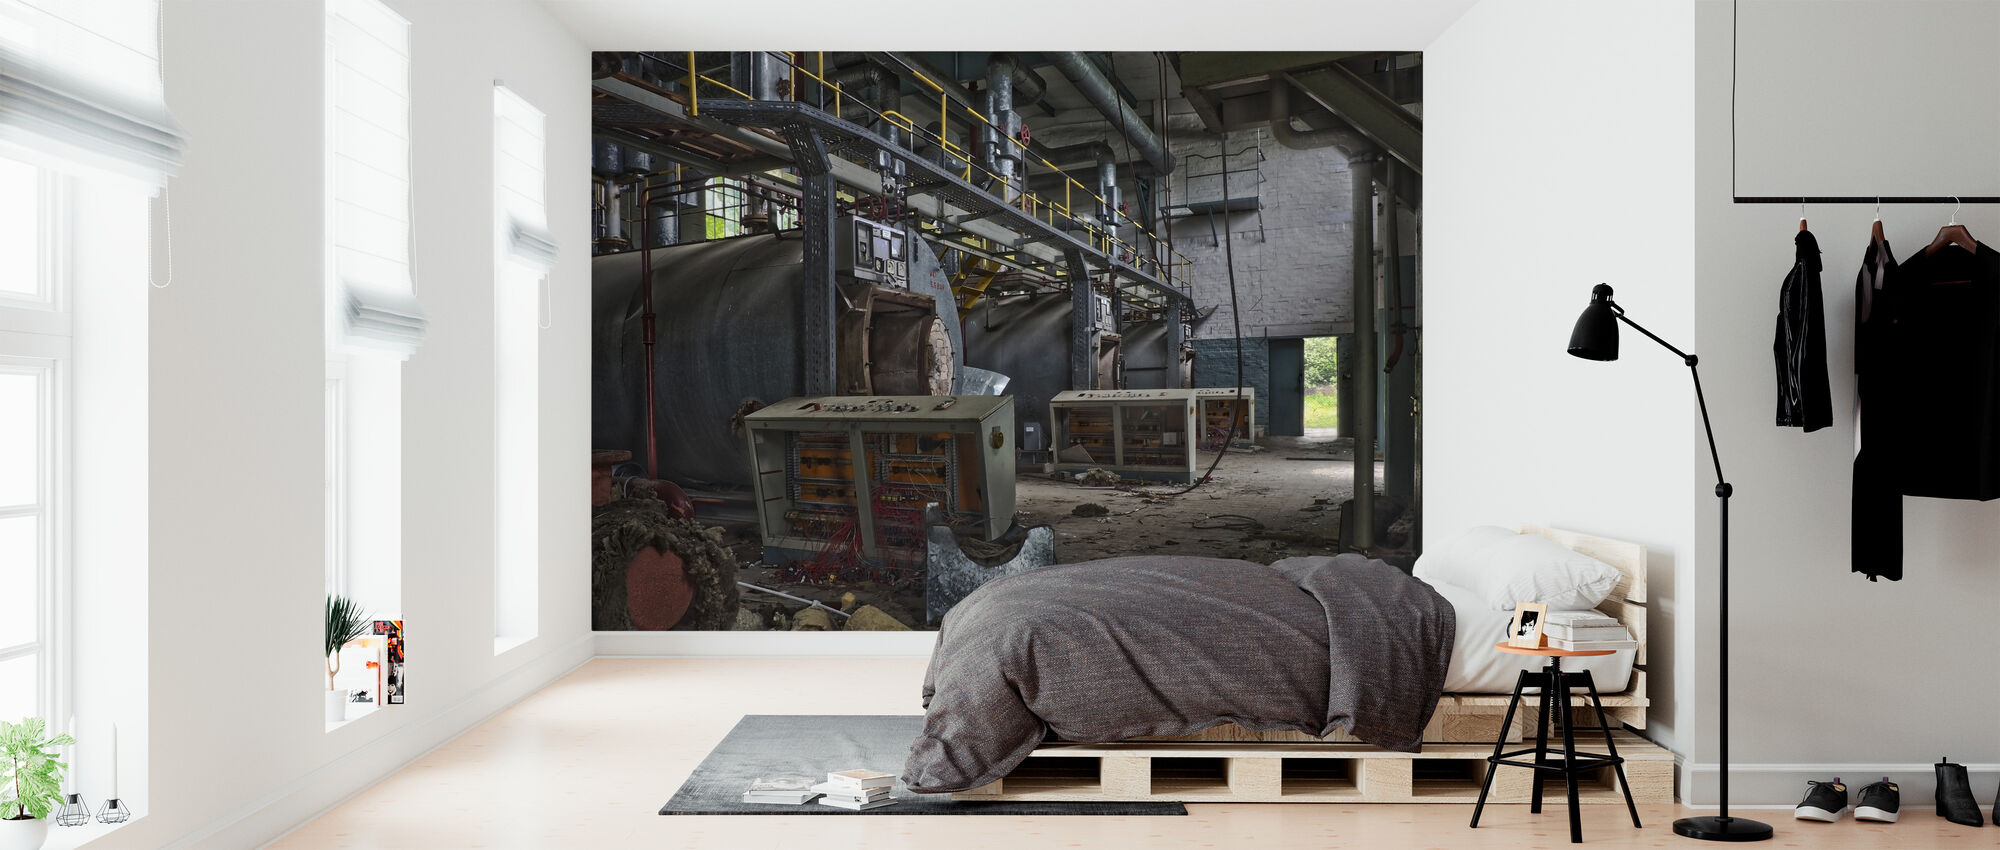 Abandoned Boiler Room - Wallpaper - Bedroom